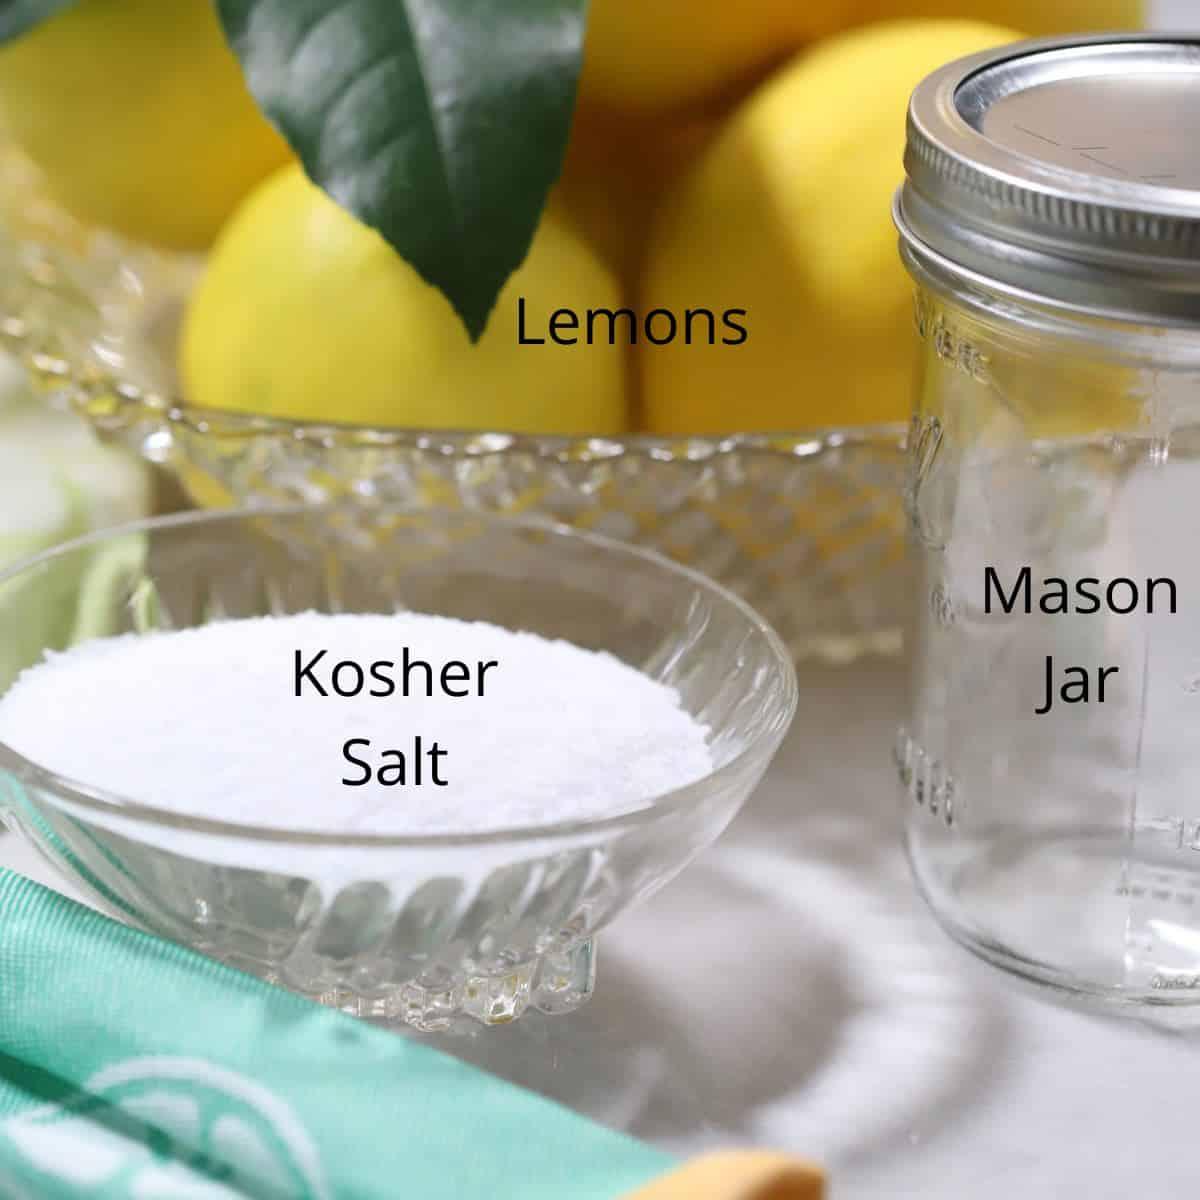 A bowl of kosher salt, lemons and a mason jar.